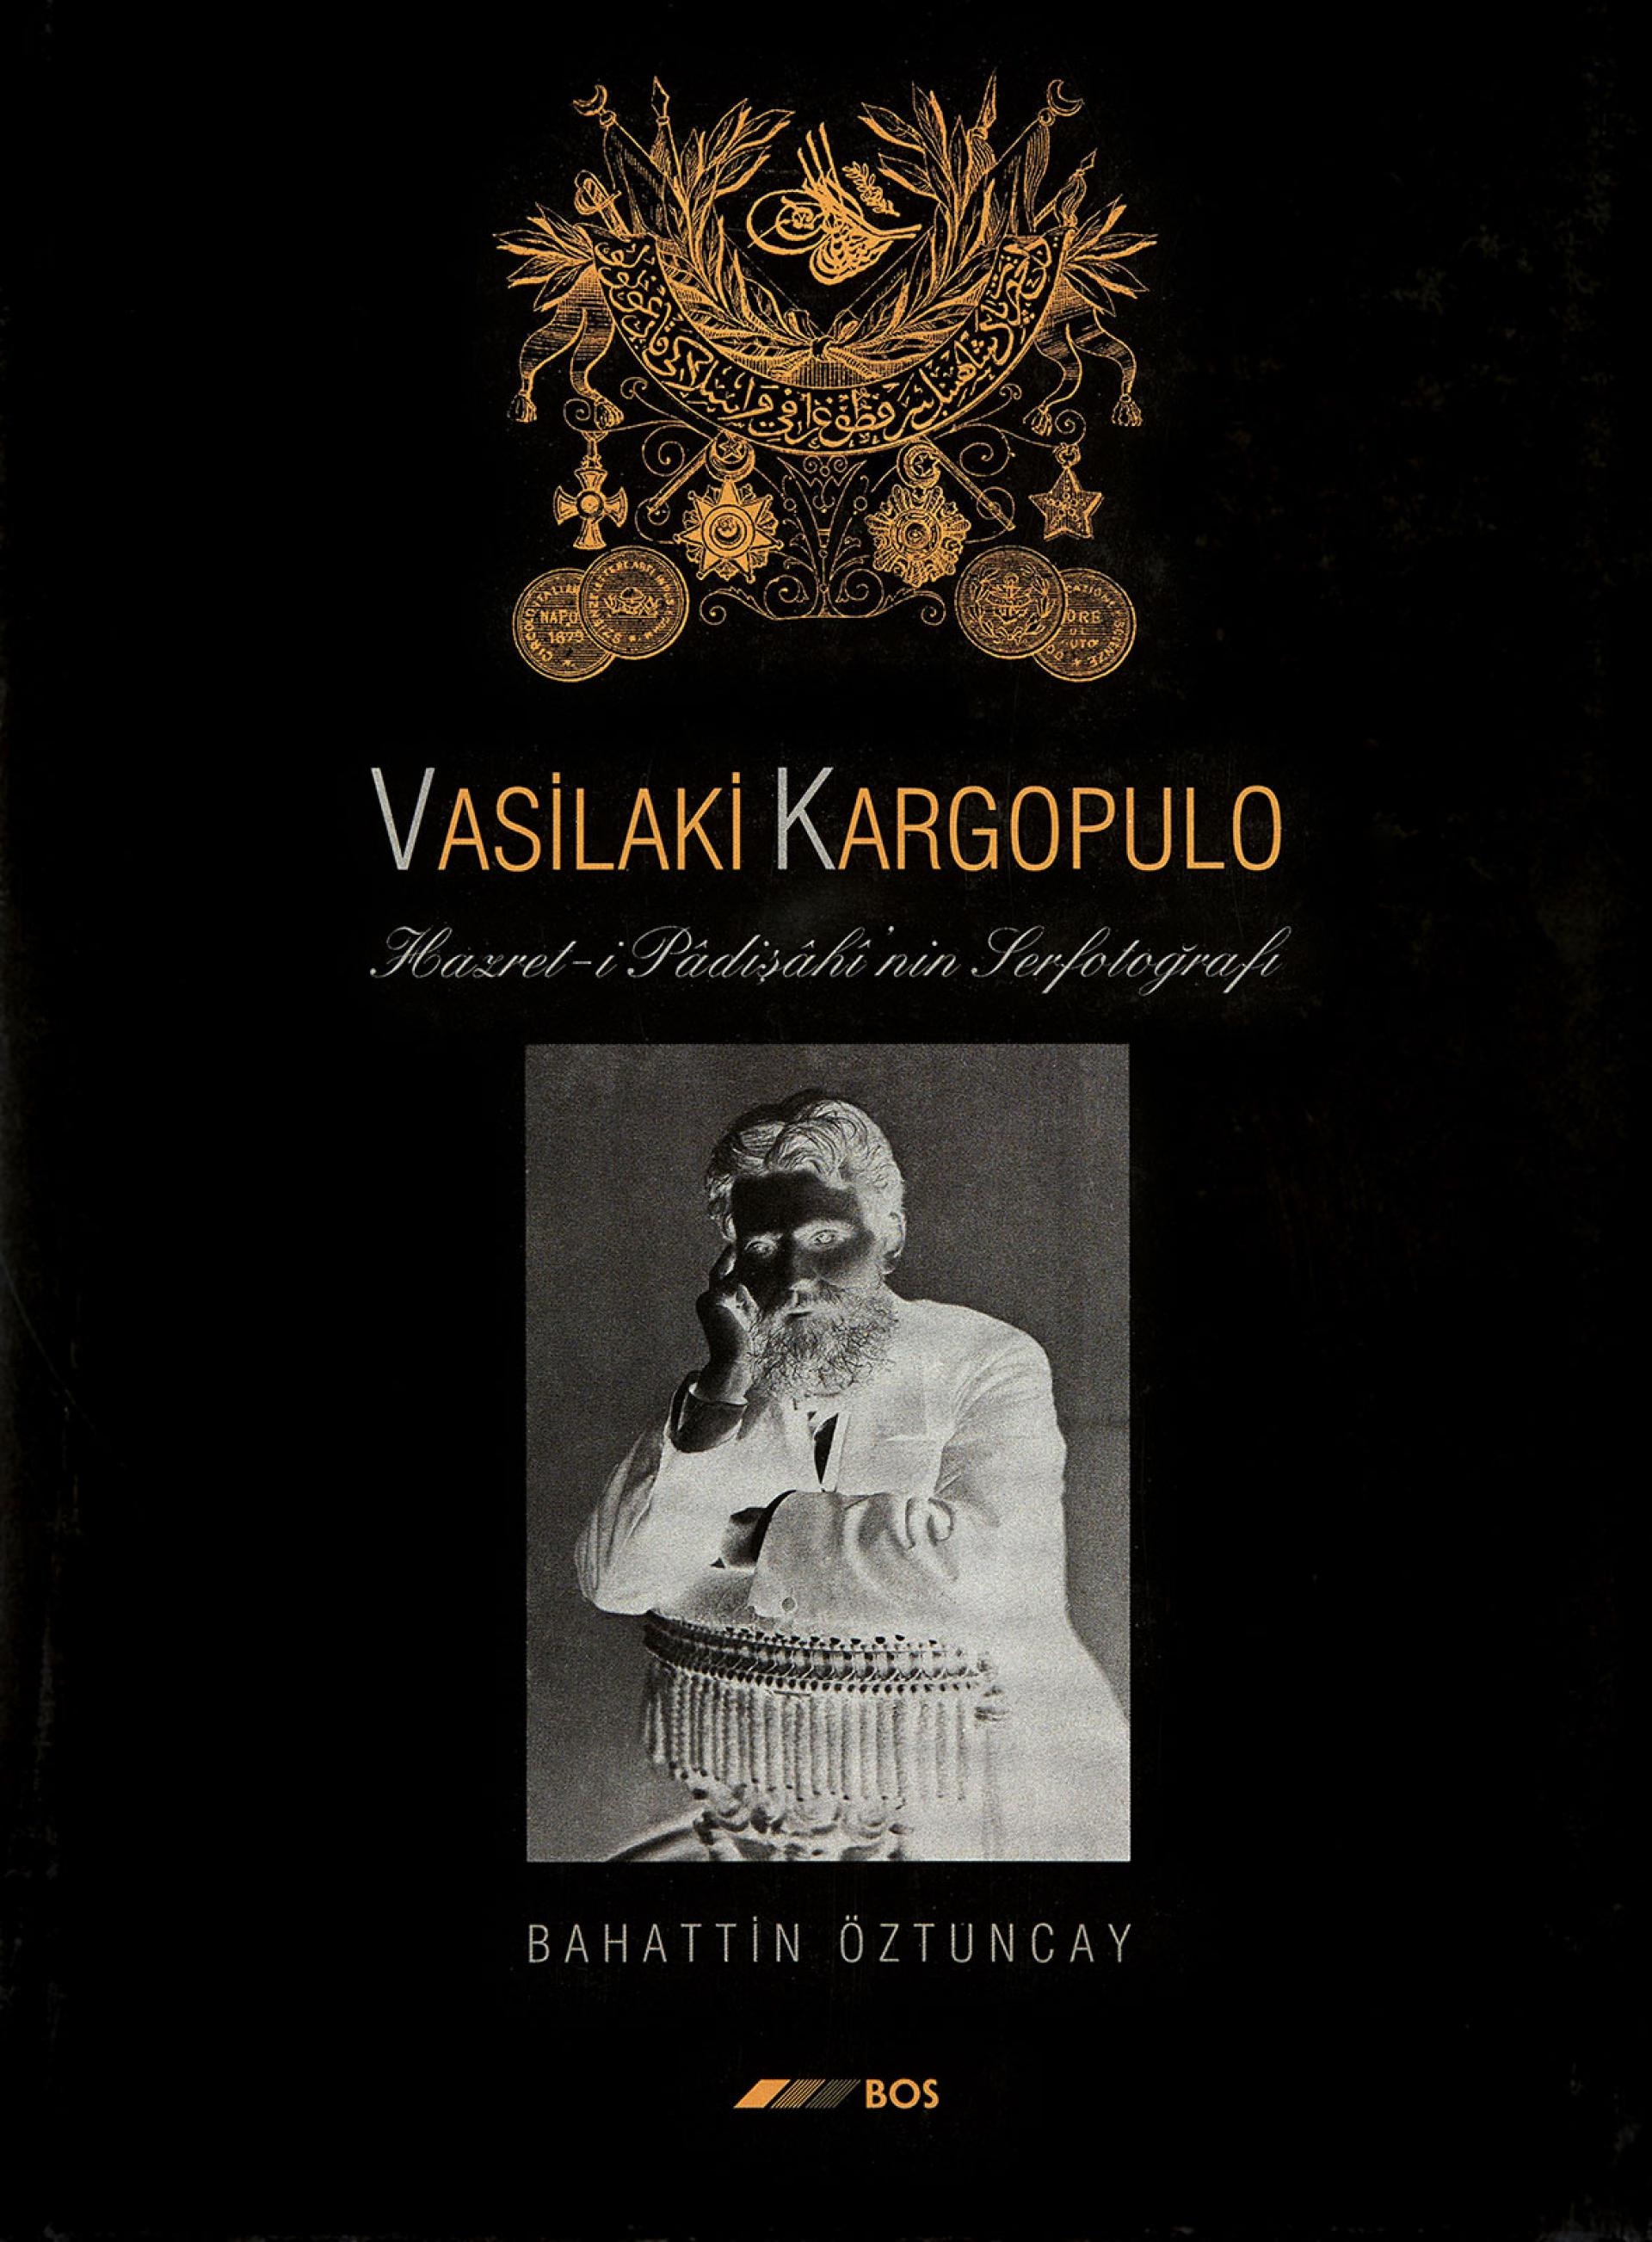 Vasilaki Kargopulo - Hazret-i Padişahı - BOOKS - Sadberk Hanım Museum